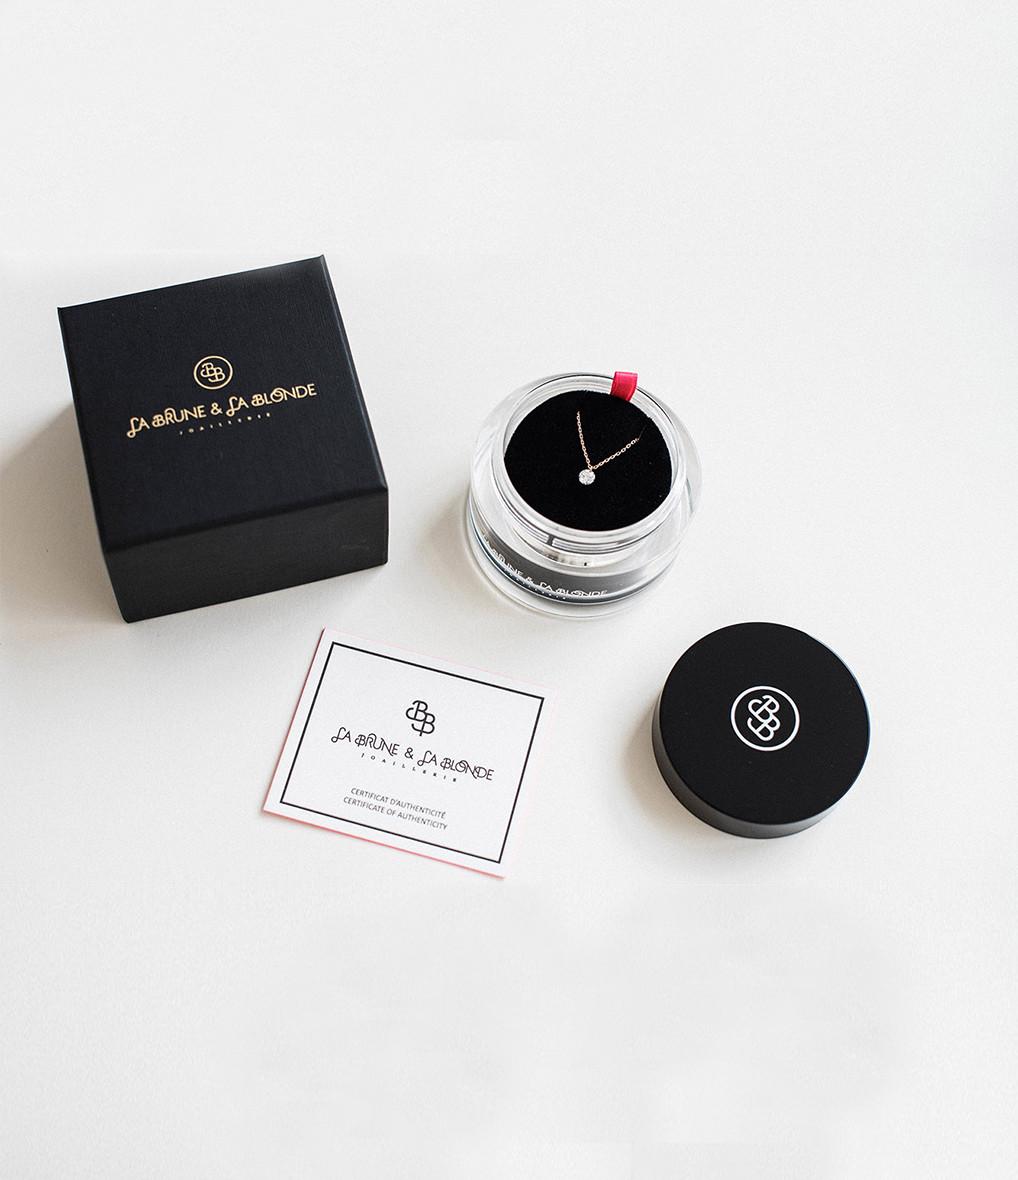 LA BRUNE & LA BLONDE - Créoles Confetti Améthyste Or Rose